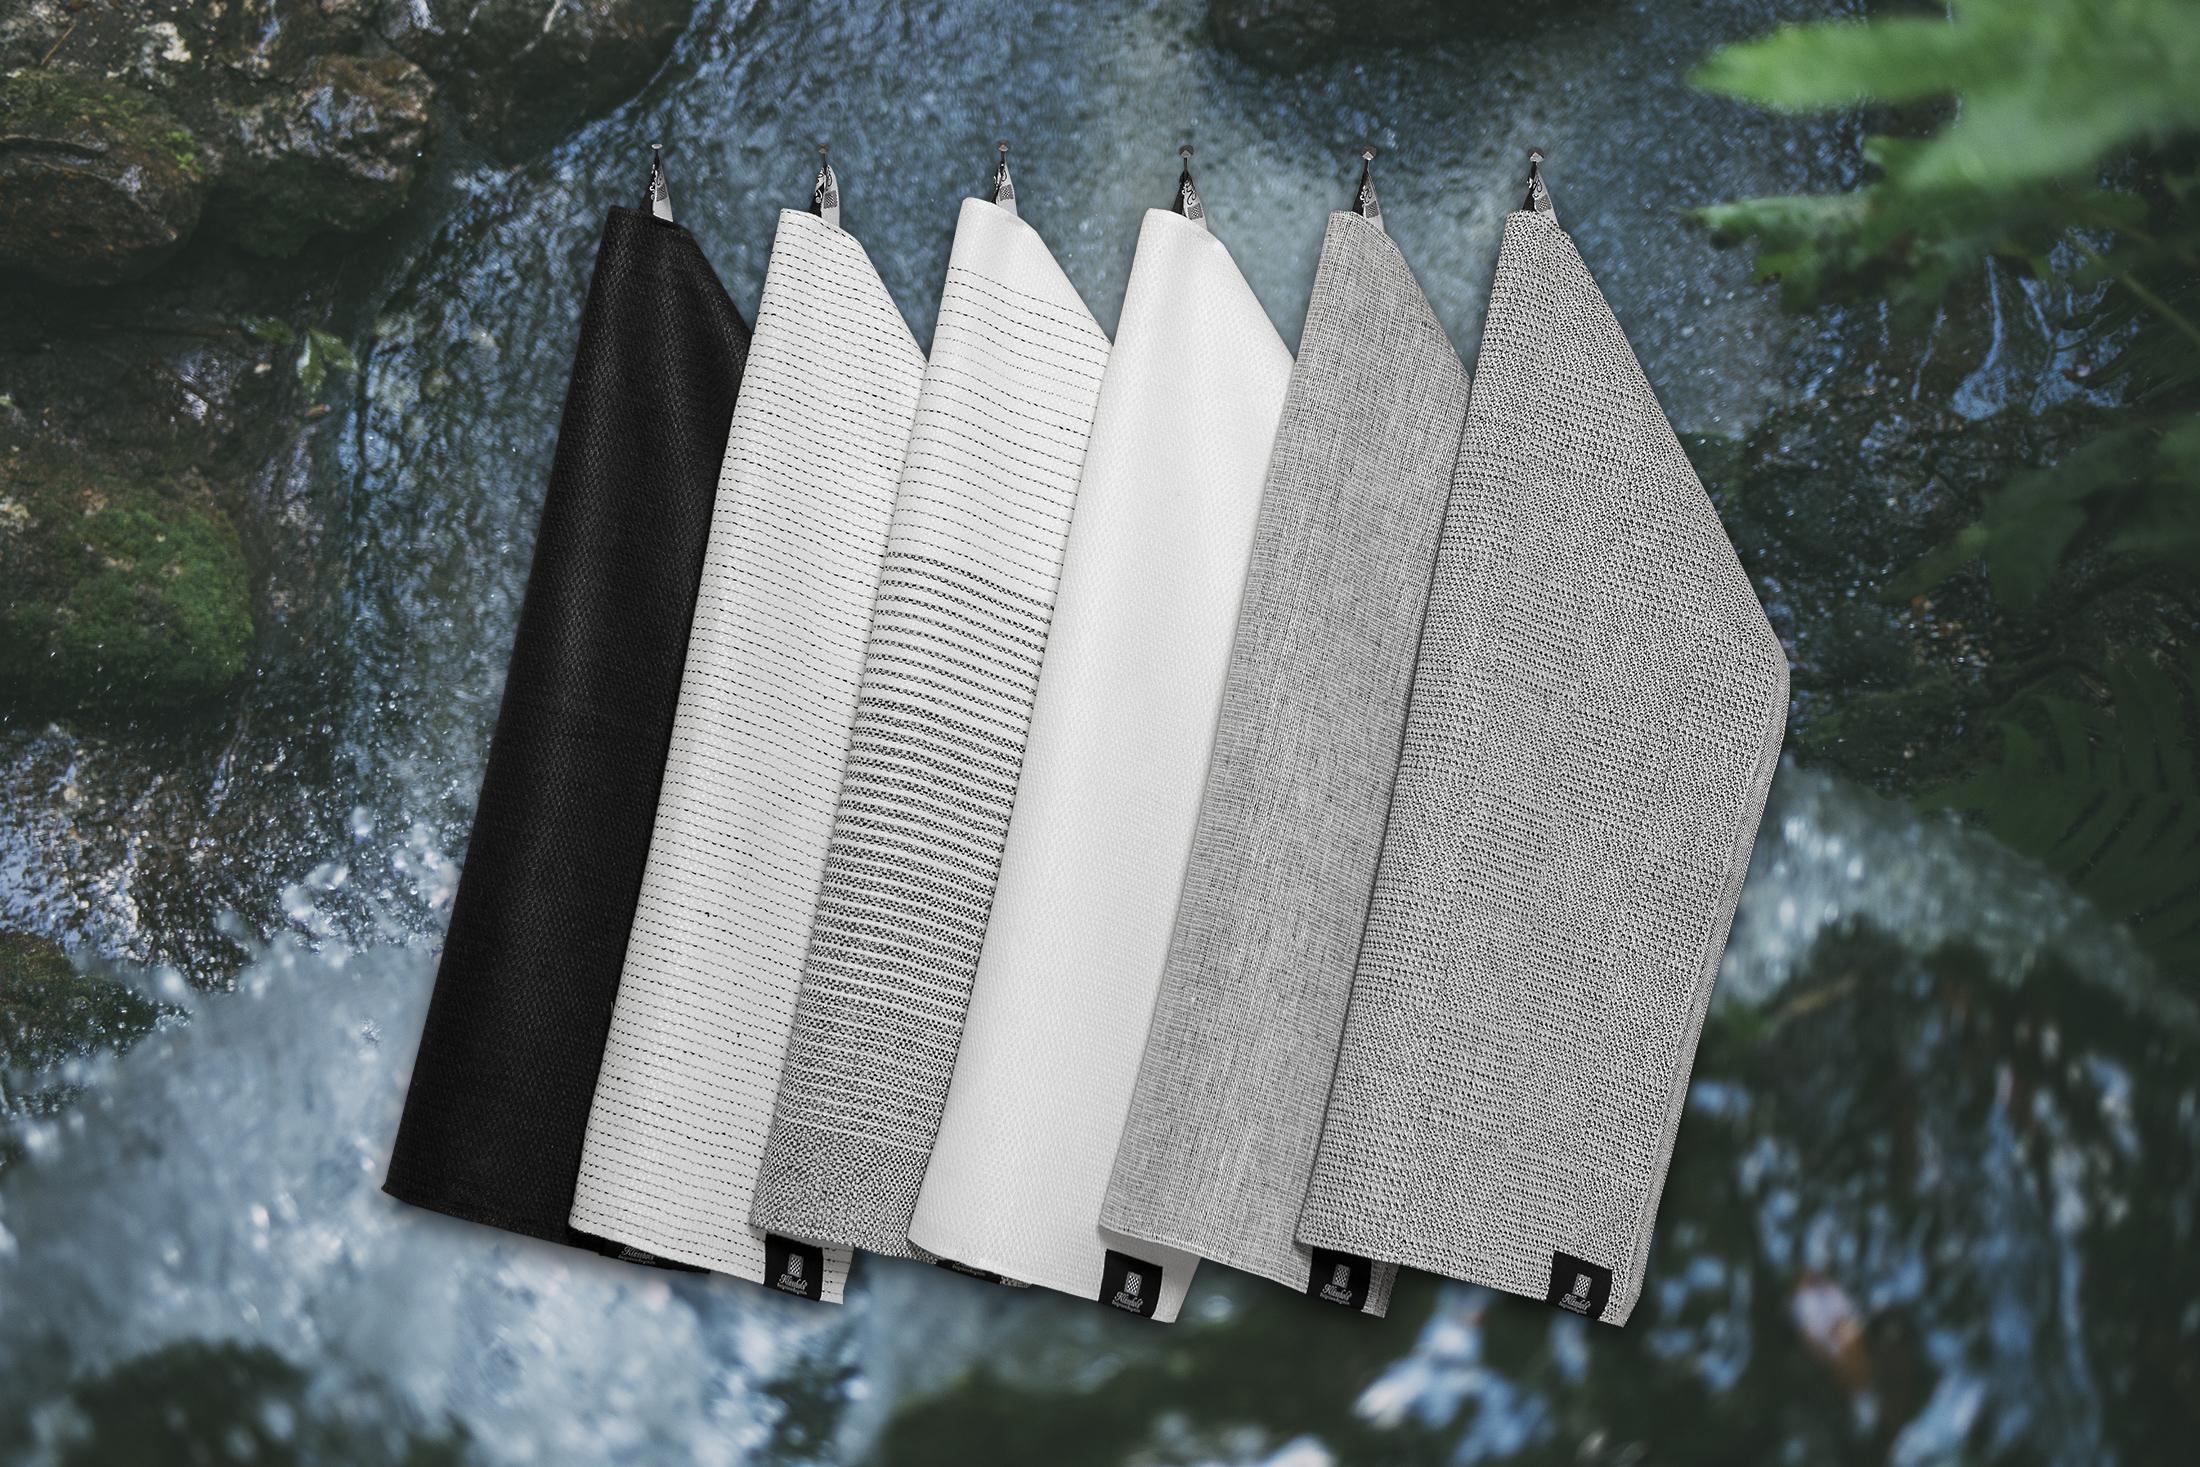 bada-hørhåndklæde-viskestykke-klassbols-linnevaveri-